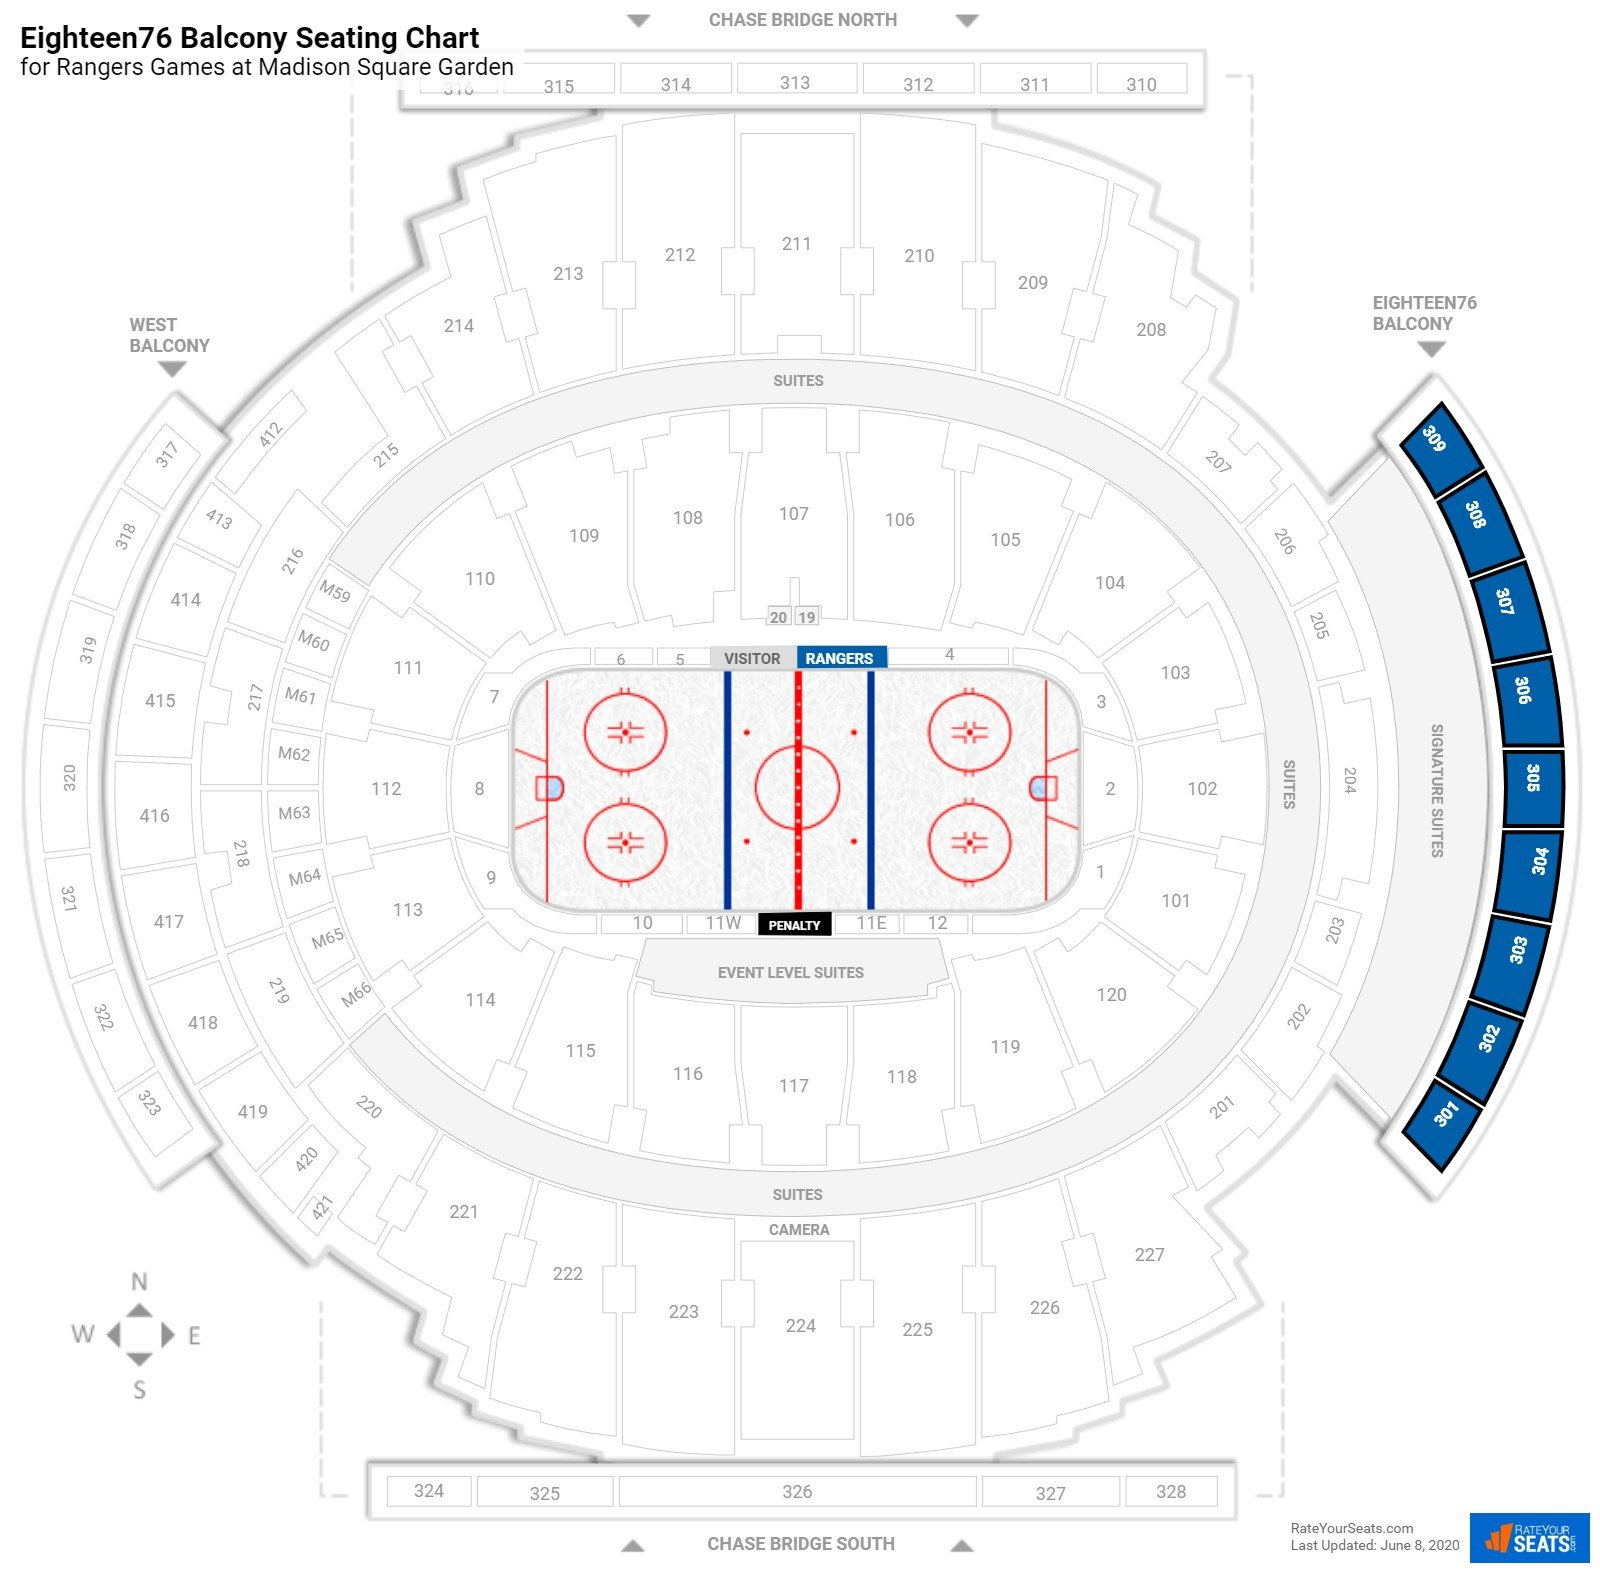 Eighteen76 Balcony Madison Square Garden Hockey Seating